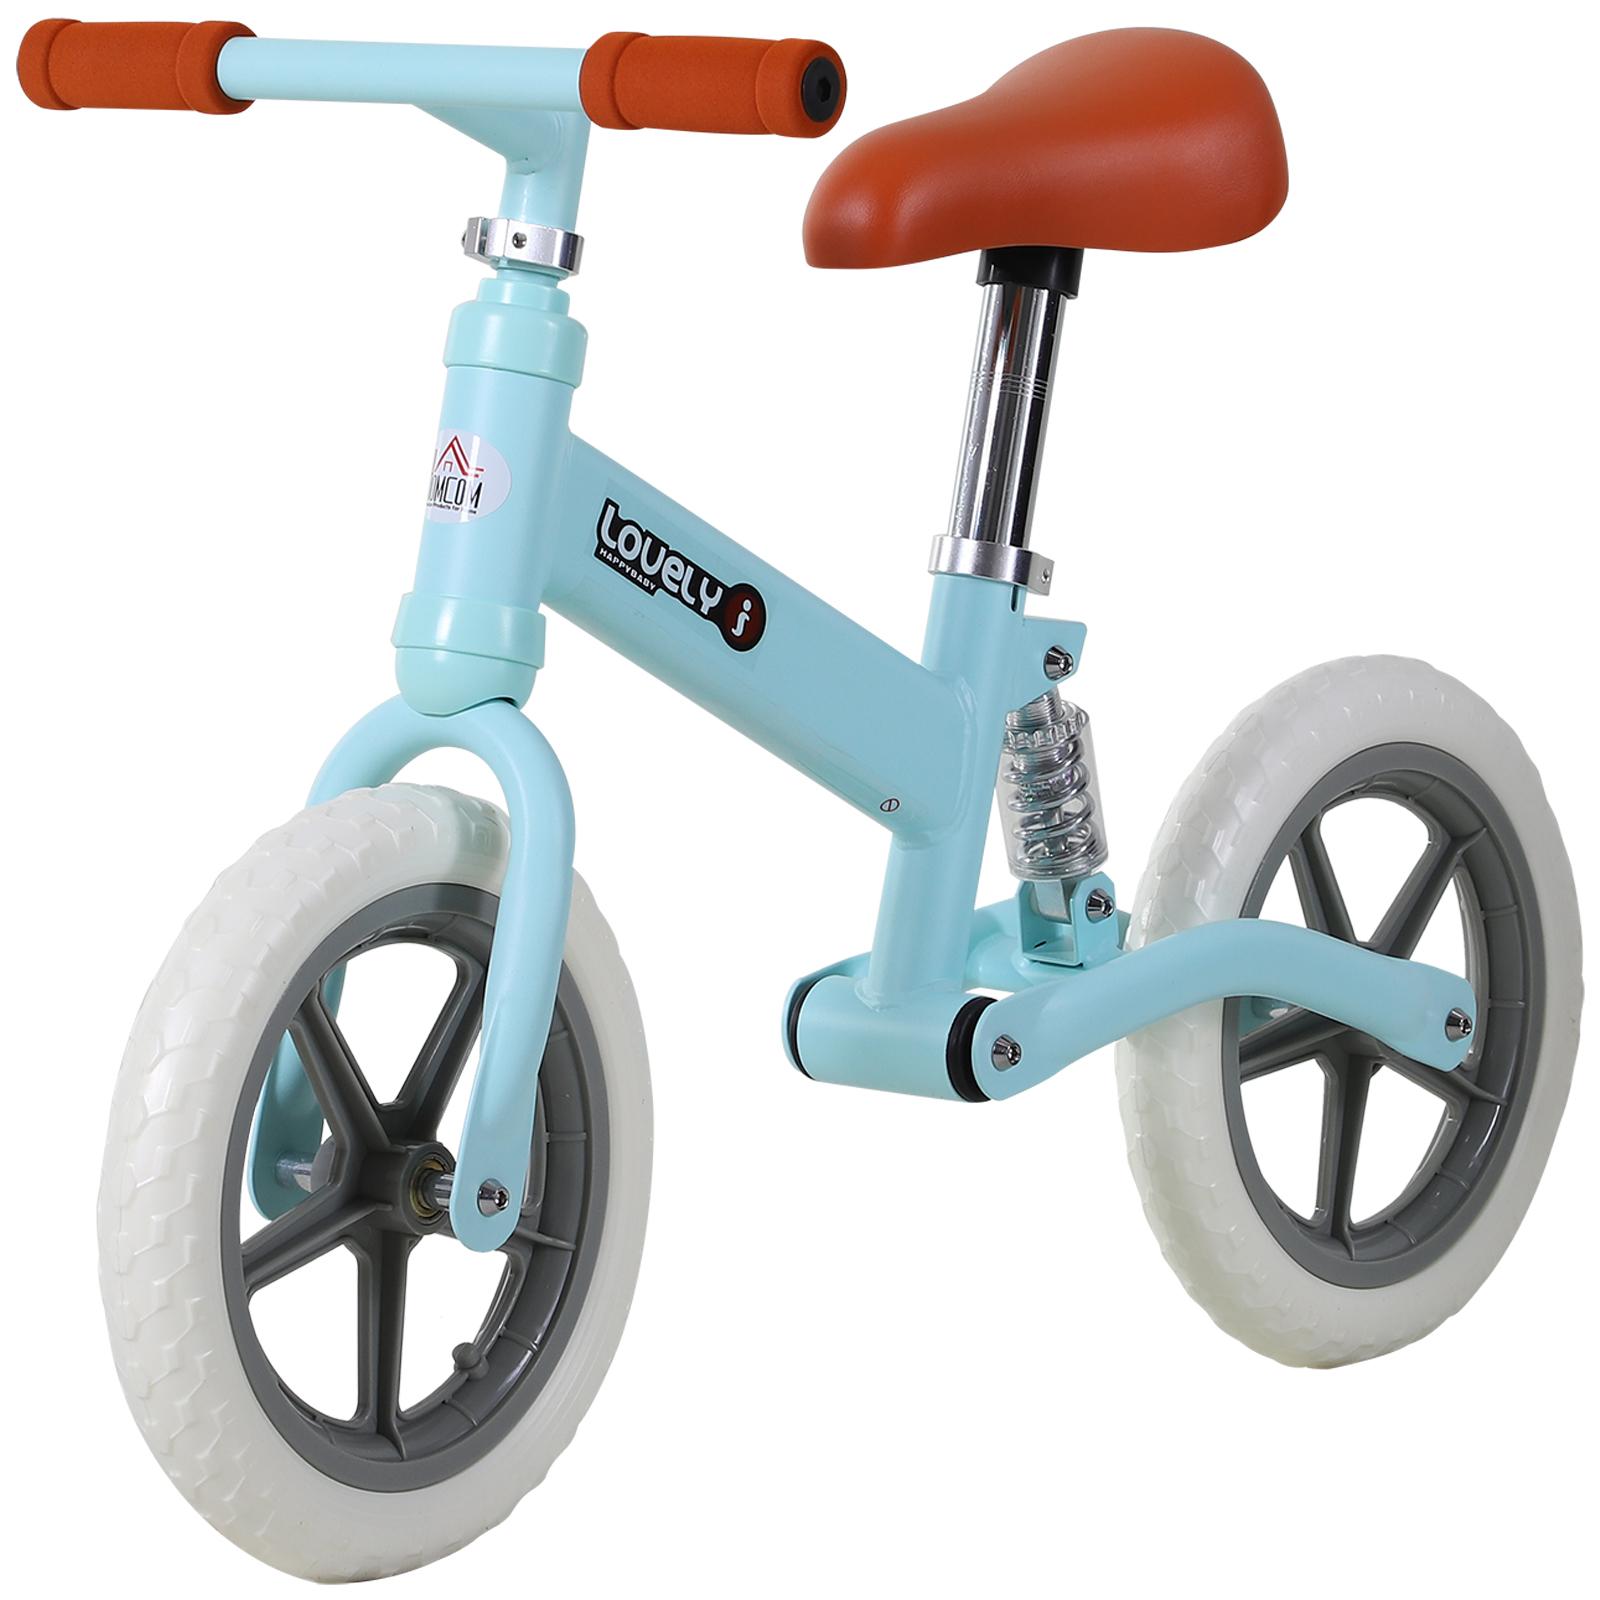 Indexbild 14 - HOMCOM Laufrad mit Stoßdämpfer Kinderrad Lauflernrad Balance Bike 2-5 Jahre